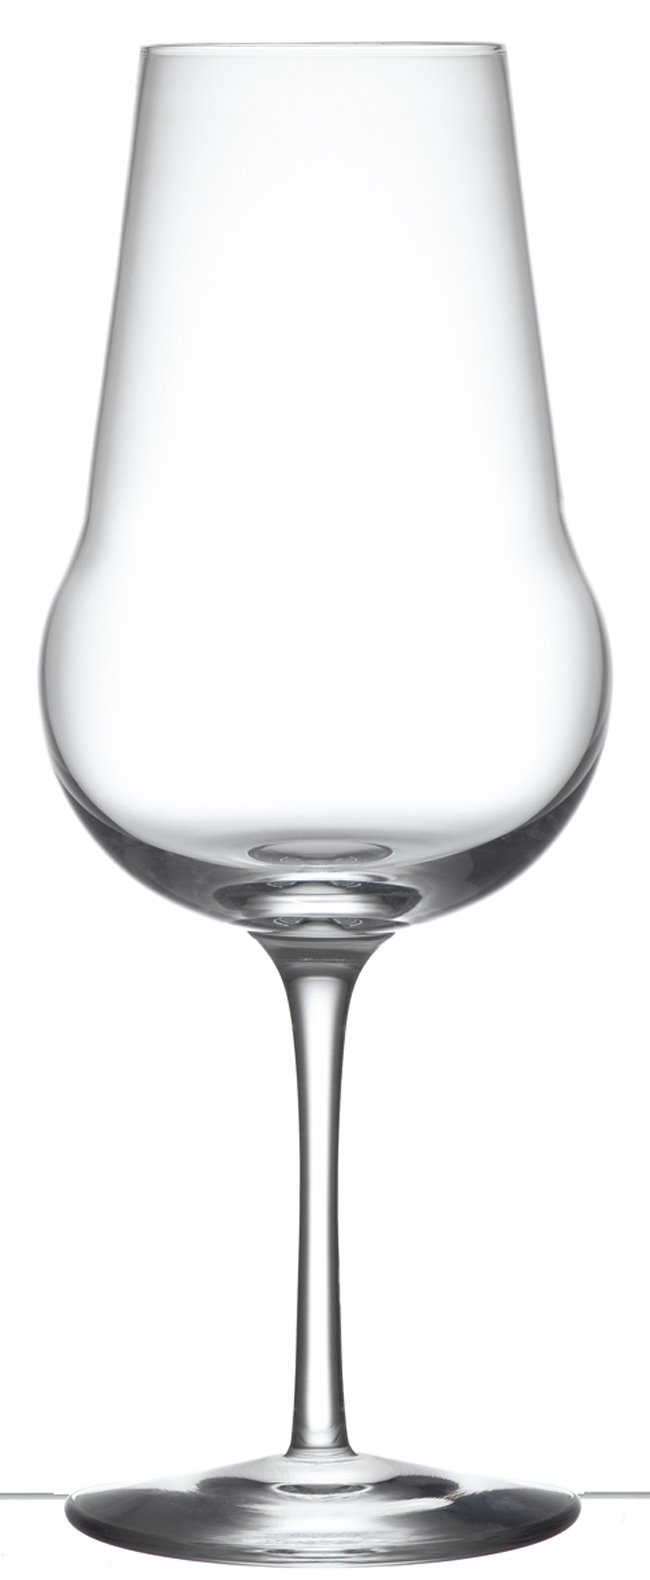 La Rochere Set Of 6, 13-ounce Echo Mouth Blown Glasses